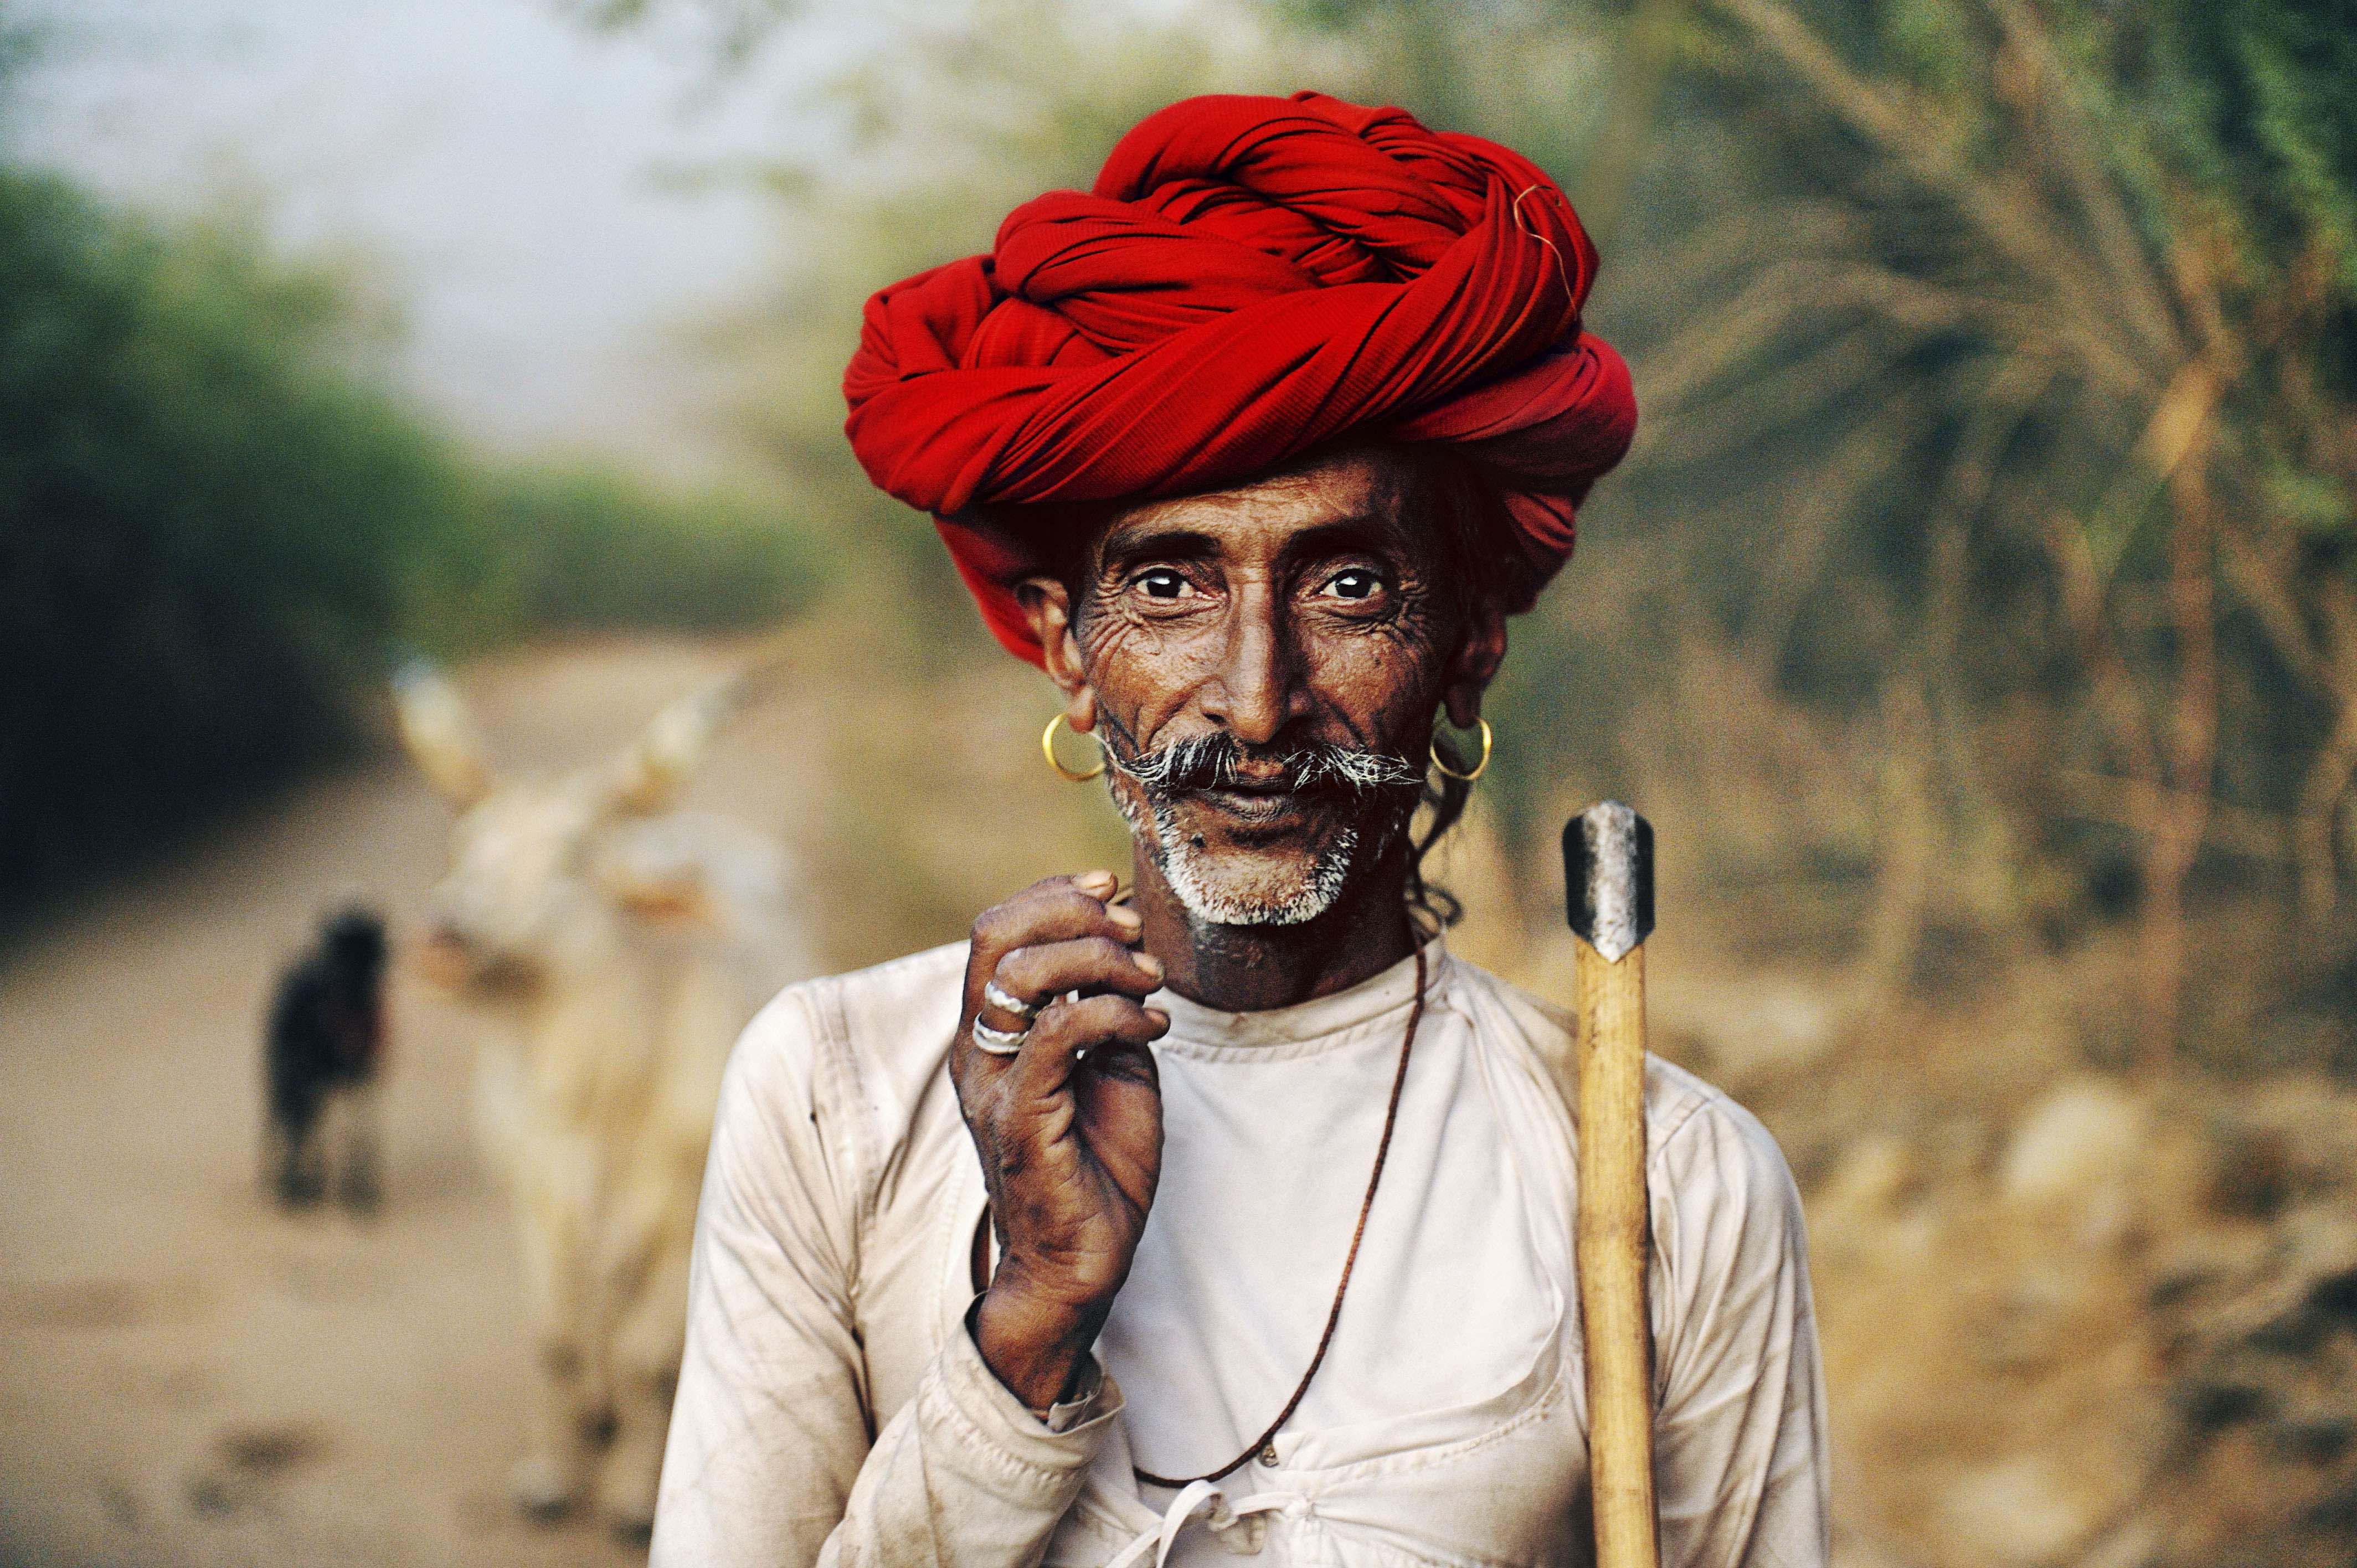 Rabari shepherd. Rajasthan, India. 2009 © Steve McCurry / Magnum Photos